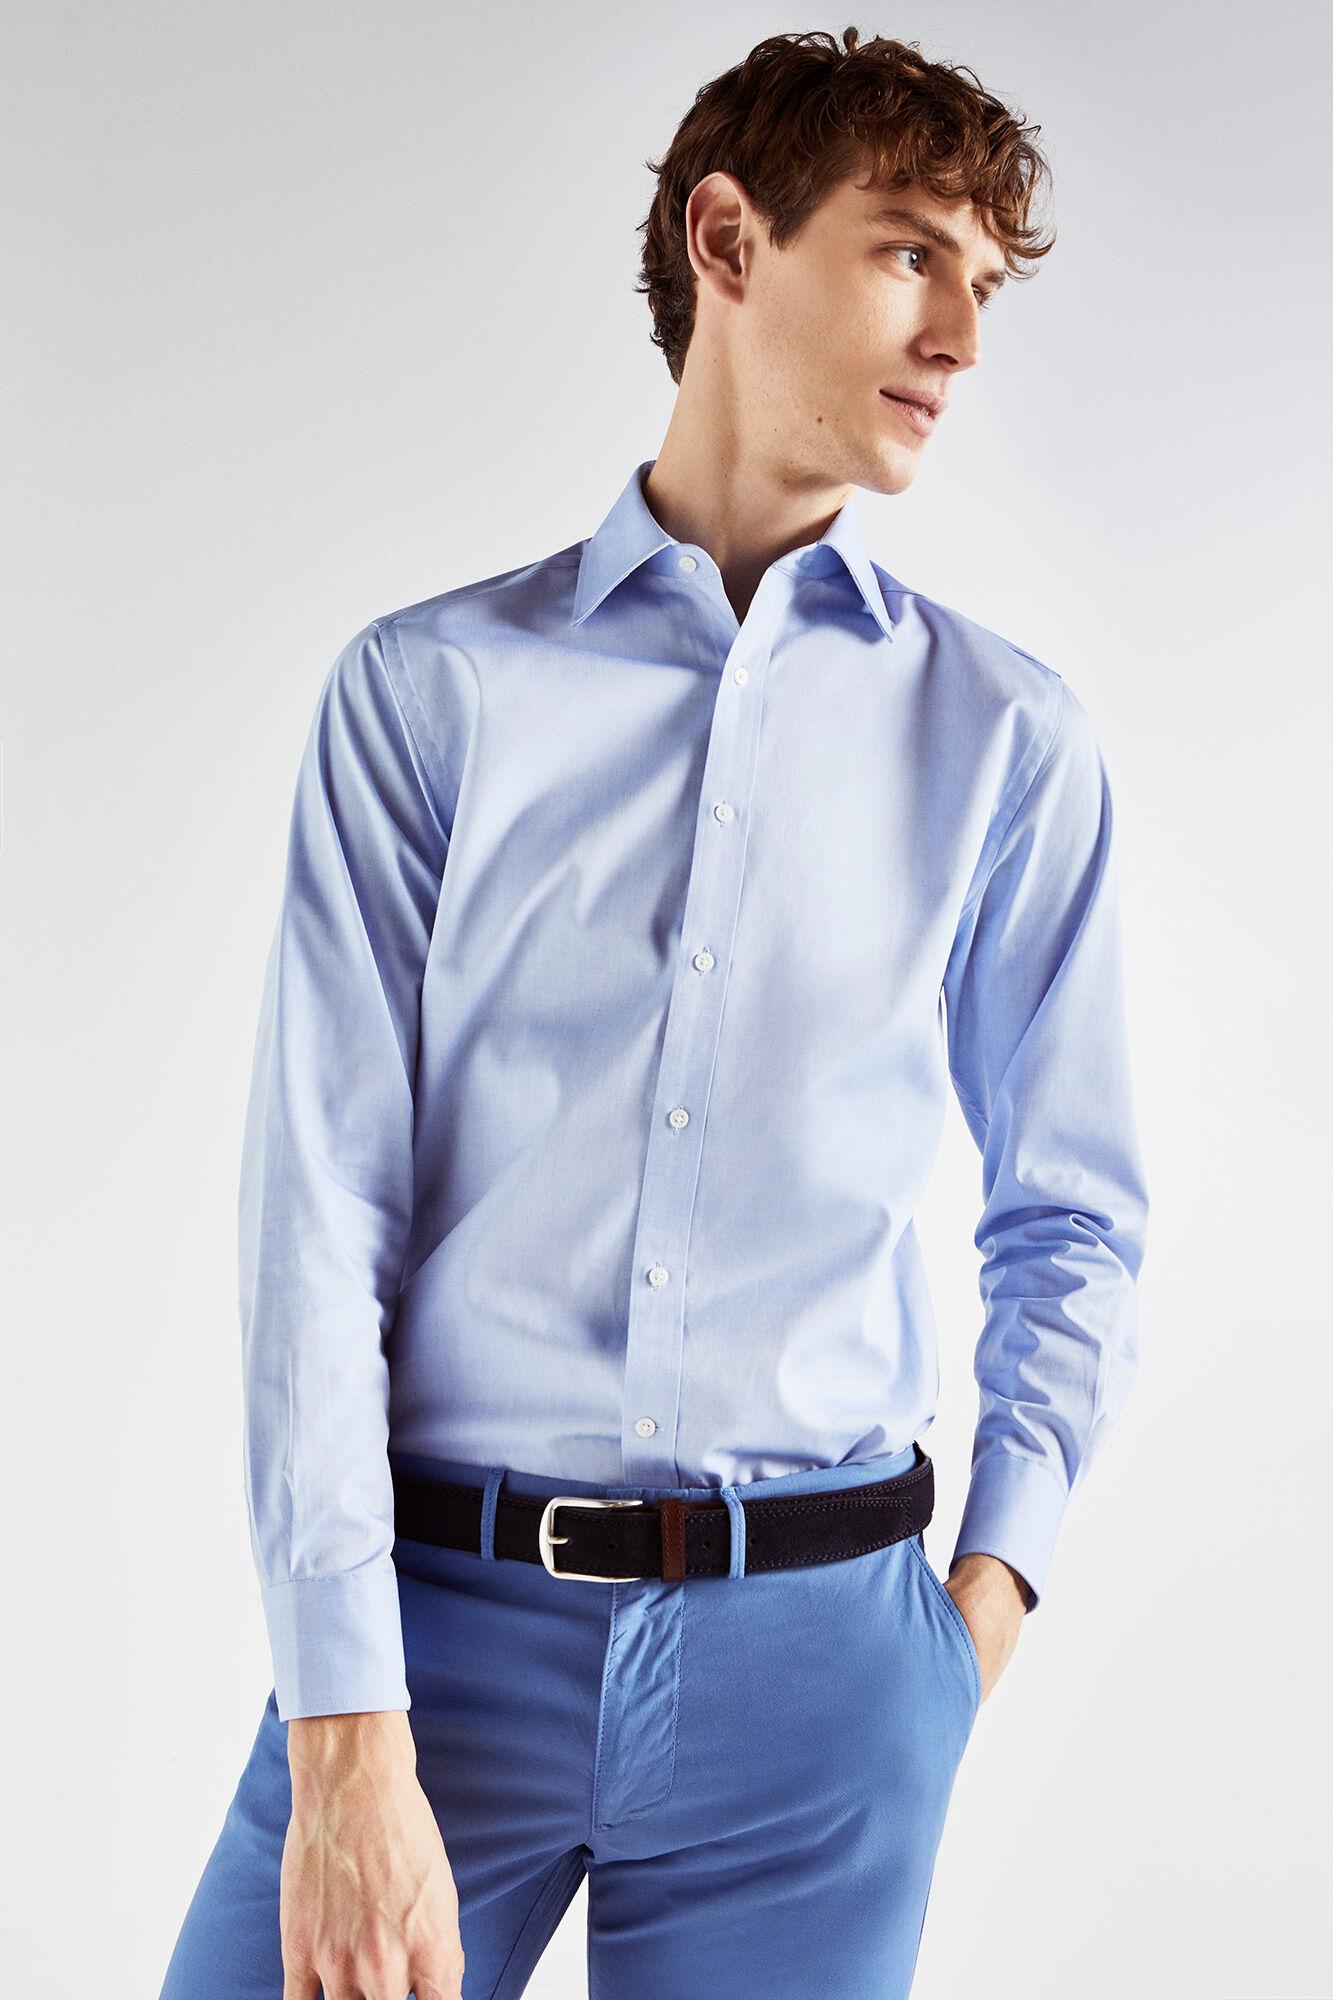 Sale Release Dates Mens Camisa Vestir Lisa Tailored Shirt Pedro del Hierro Clearance Best Seller YkDmC9j